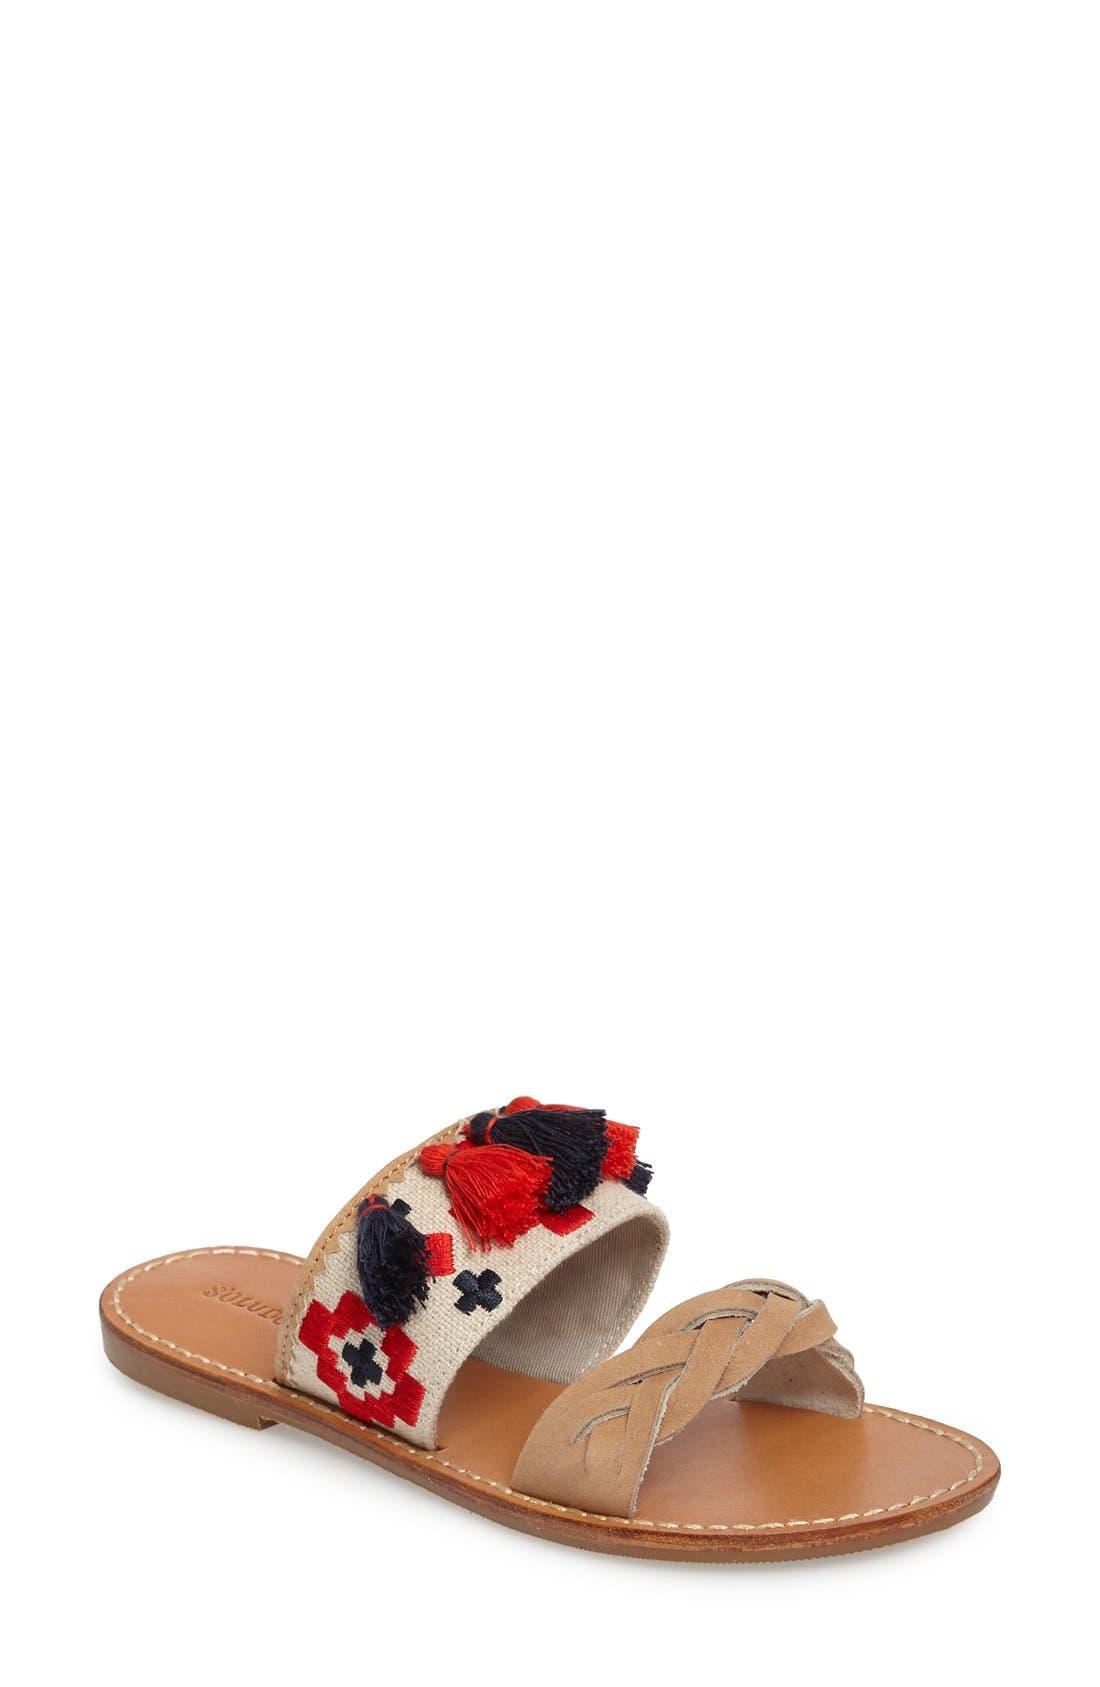 Alternate Image 1 Selected - Soludus Embroidered Slide Sandal (Women)